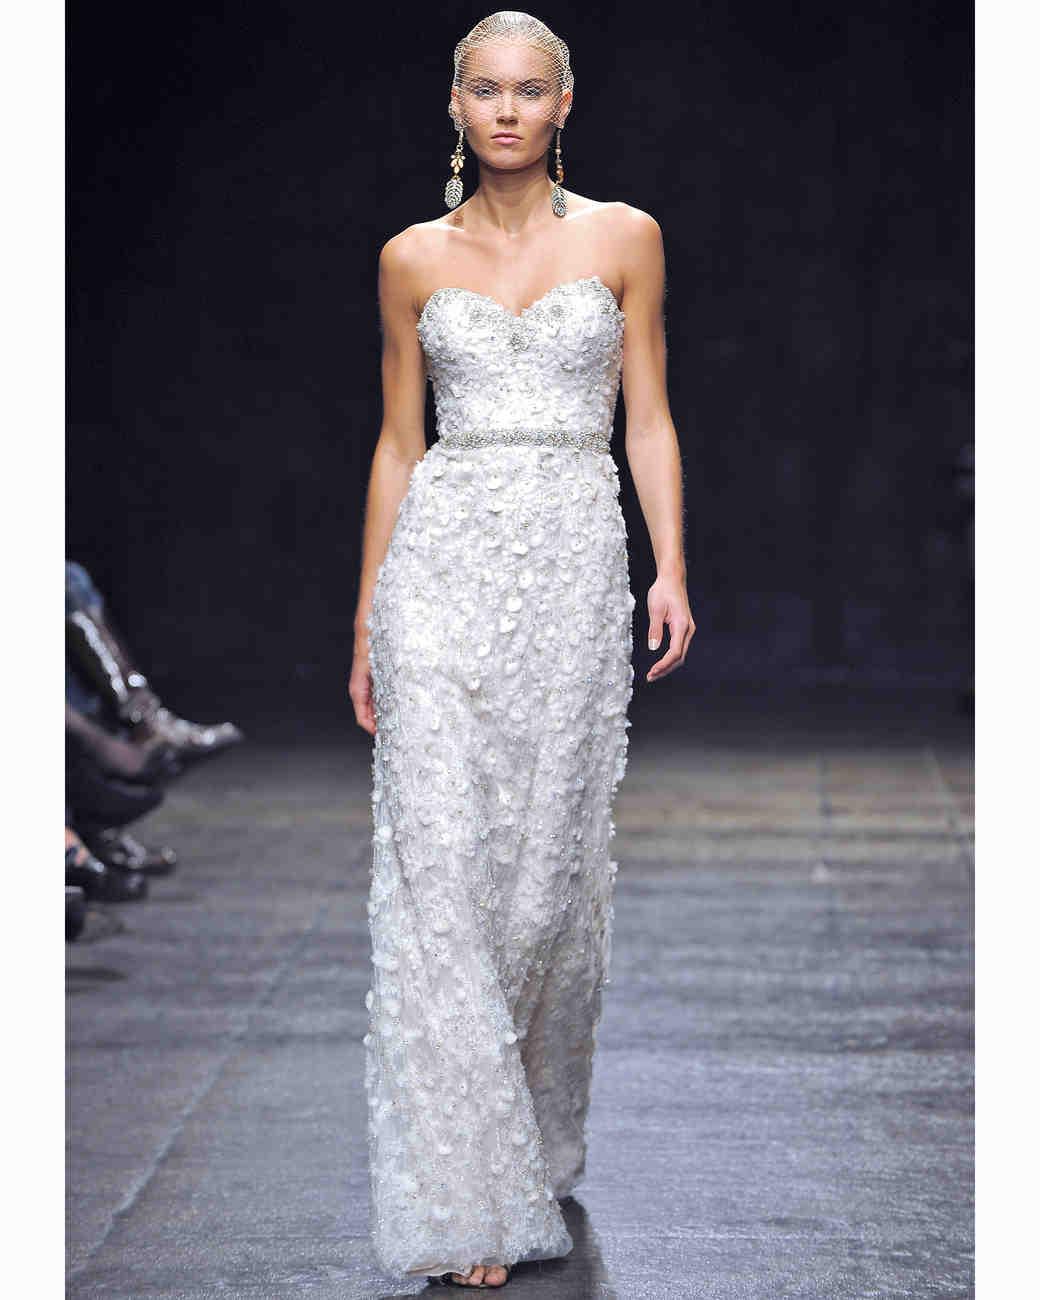 Wedding dresses floral embellishments bridesmaid dresses for We buy wedding dresses